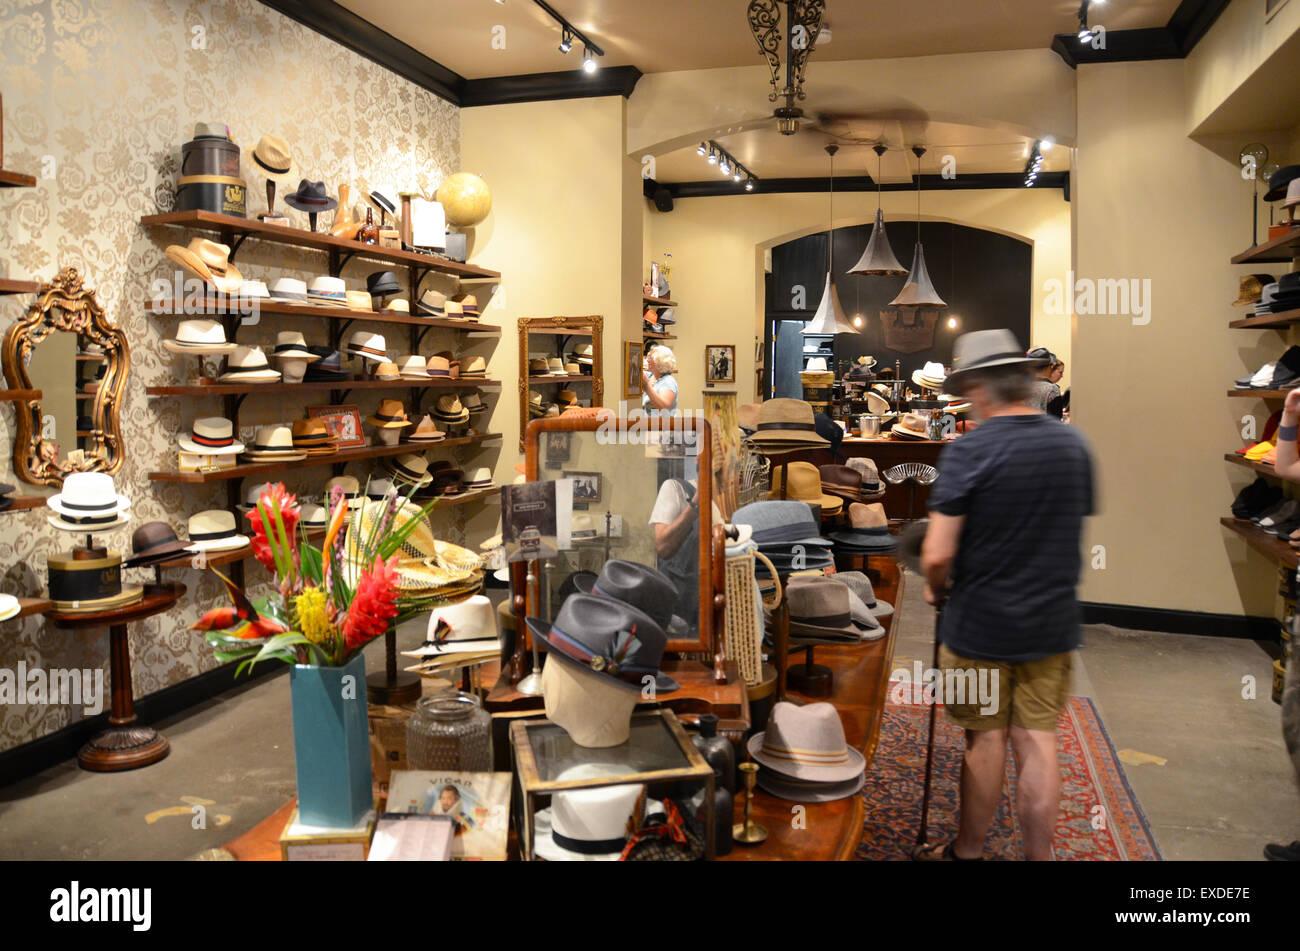 3d58b2b97a1ba goorin bros hat shop new orleans Stock Photo  85119090 - Alamy